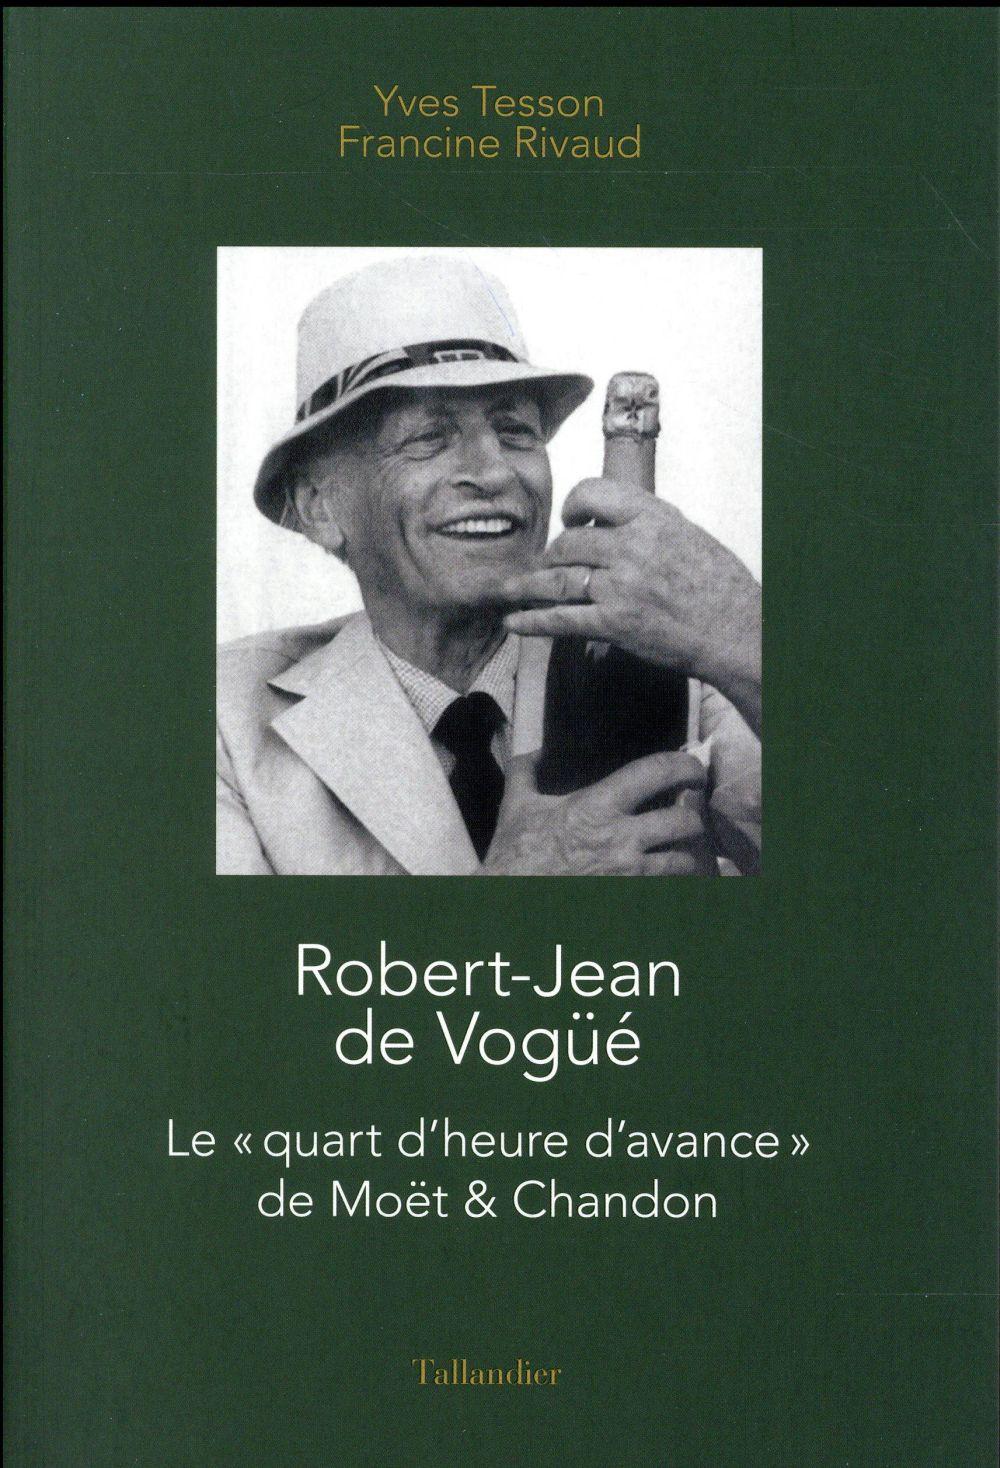 ROBERT JEAN DE VOGUE MOET & CHANDON CONQUERANT Tesson Yves Tallandier